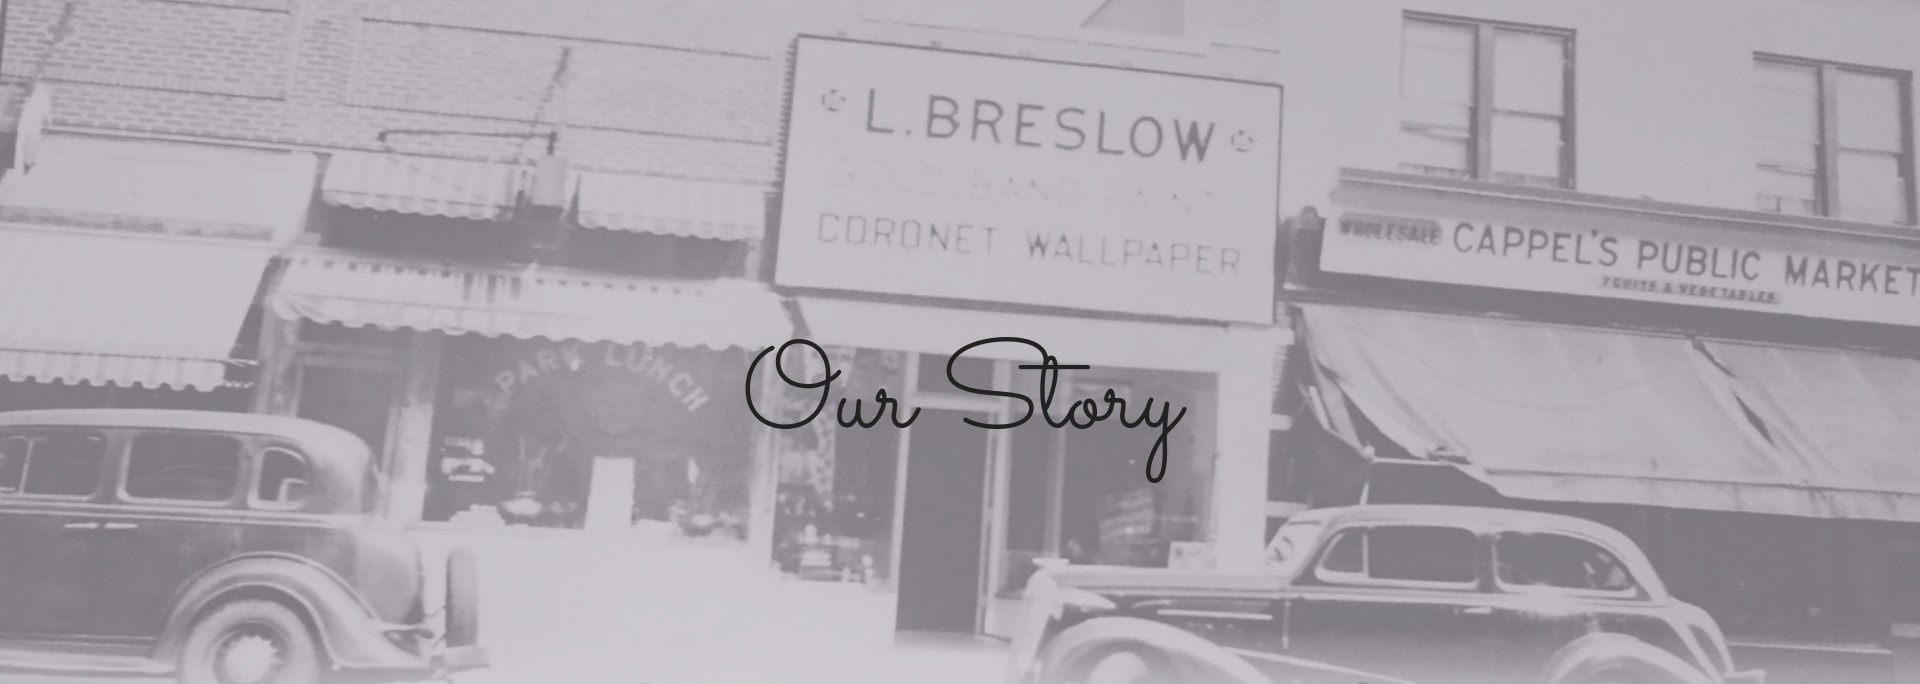 Breslow Home Design Center About Us